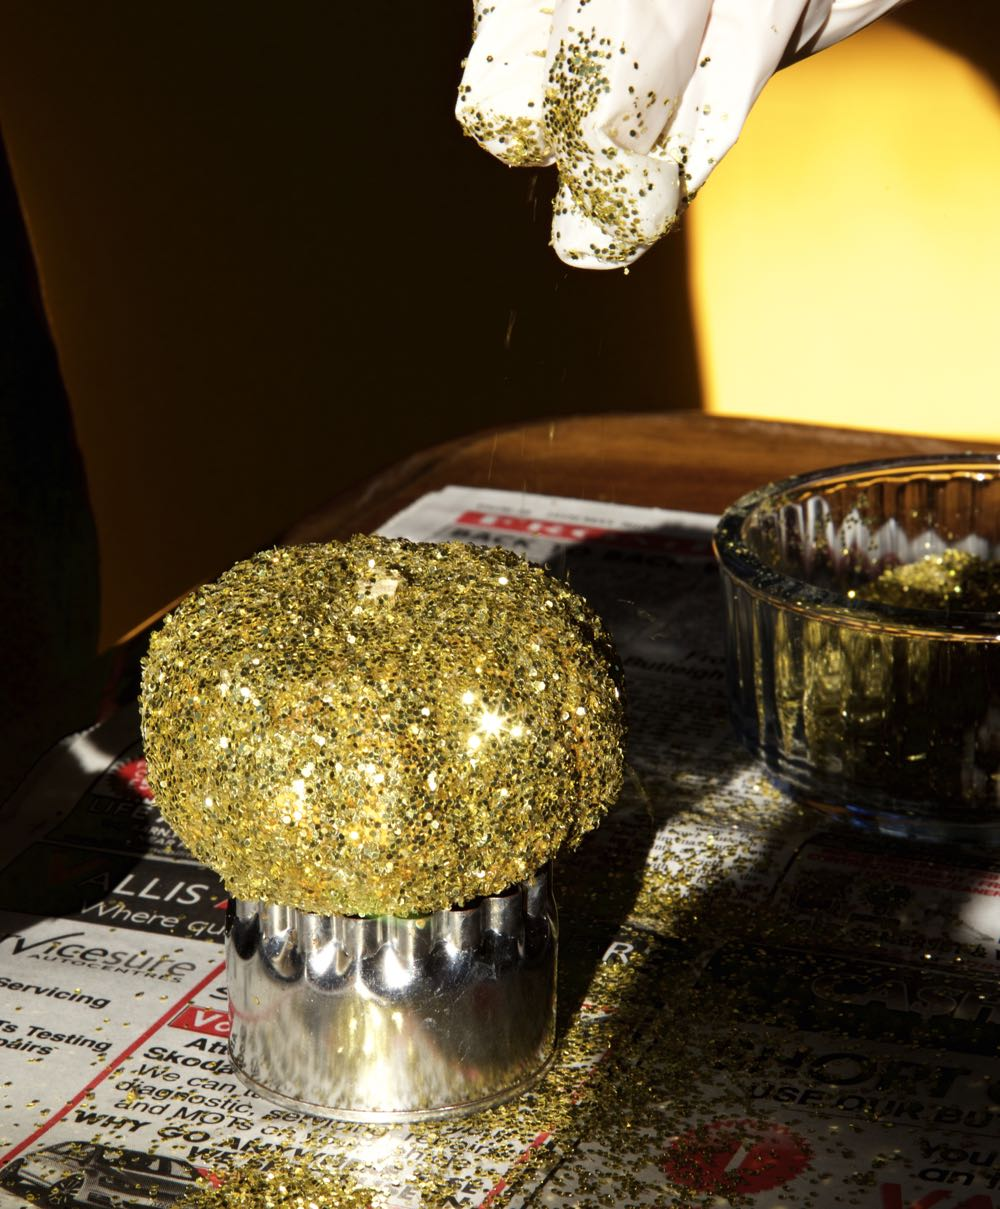 A sprinkle of glitter